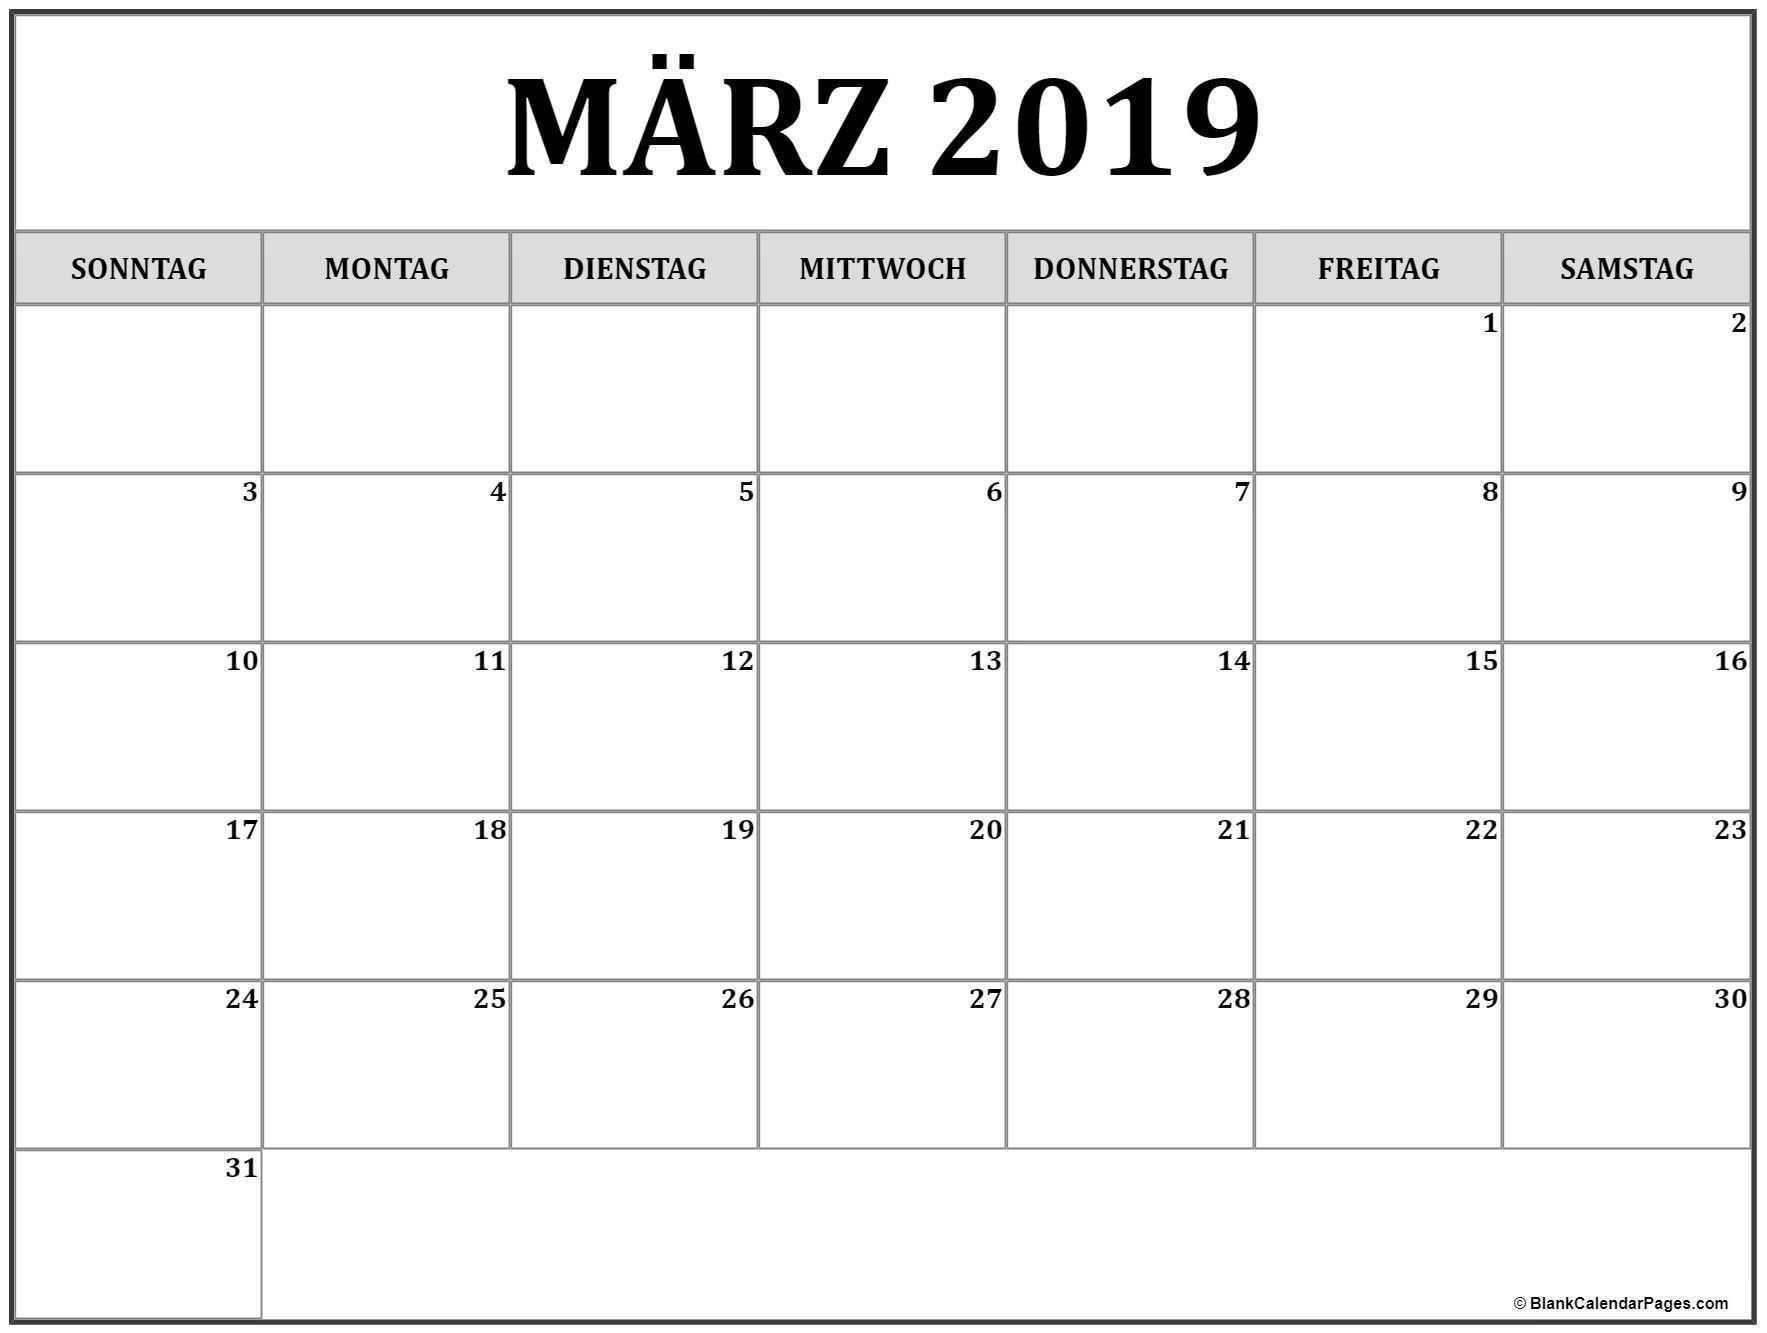 Marz 2019 Kalender Druckbarer Calendar Printables 2019 Calendar Calendar May